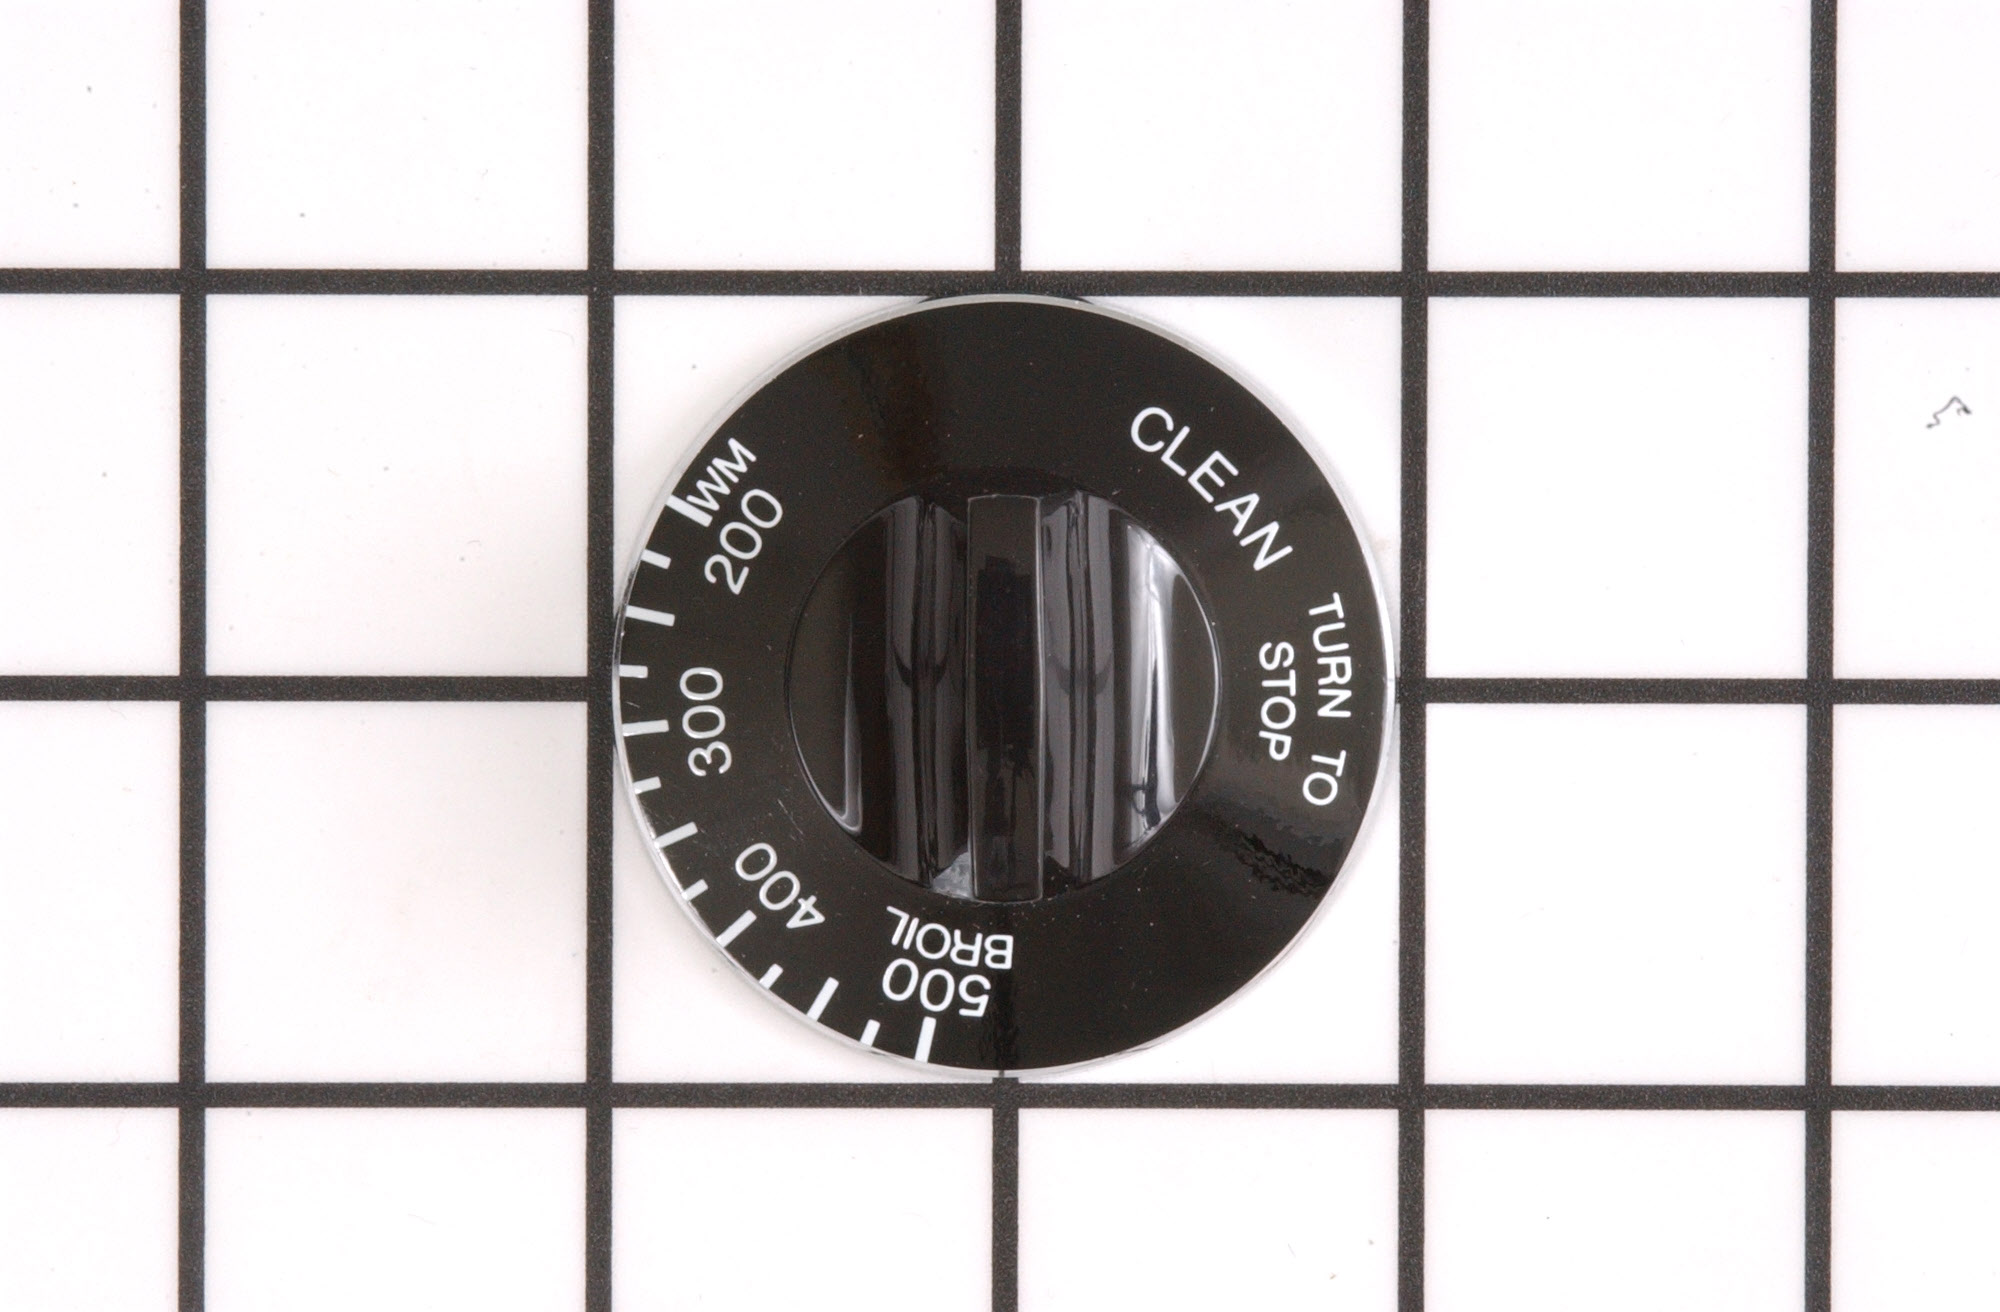 Maytag Range/Stove/Oven Part # WP7711P354-60 - Thermostat Knob